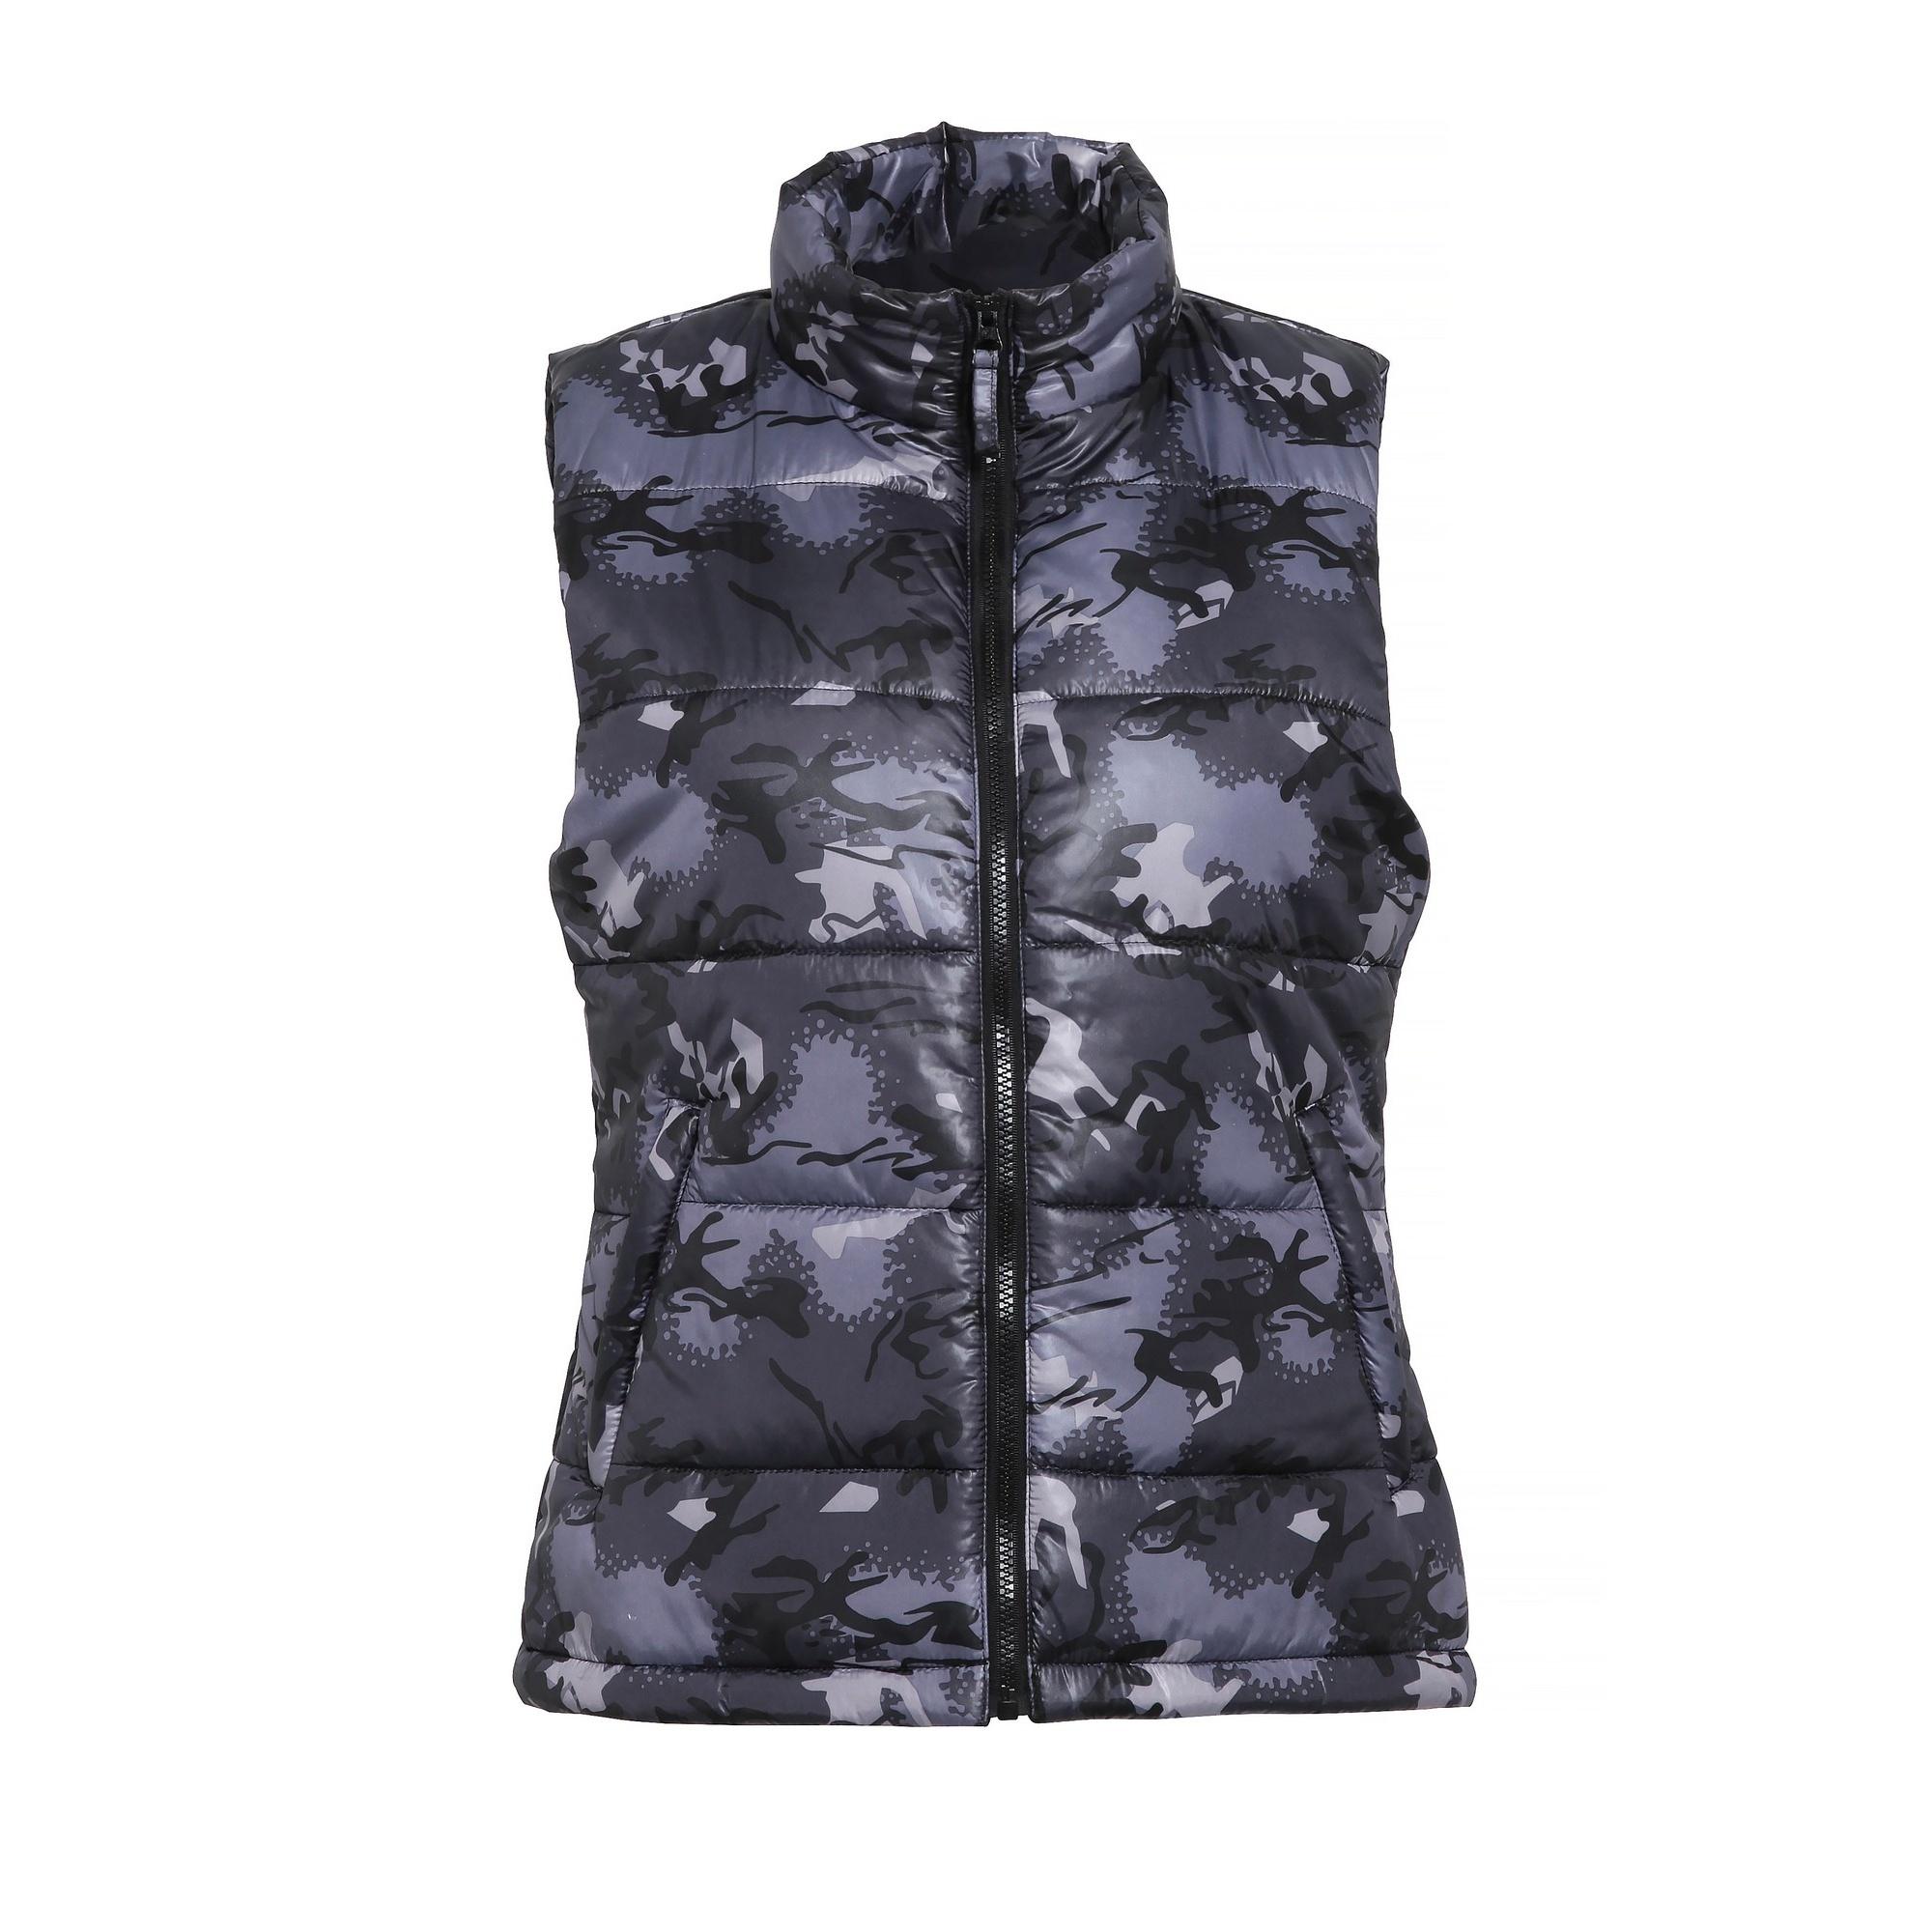 2786 Womens/Ladies Padded Bodywarmer/Gilet Jacket (XL) (Camo Grey)